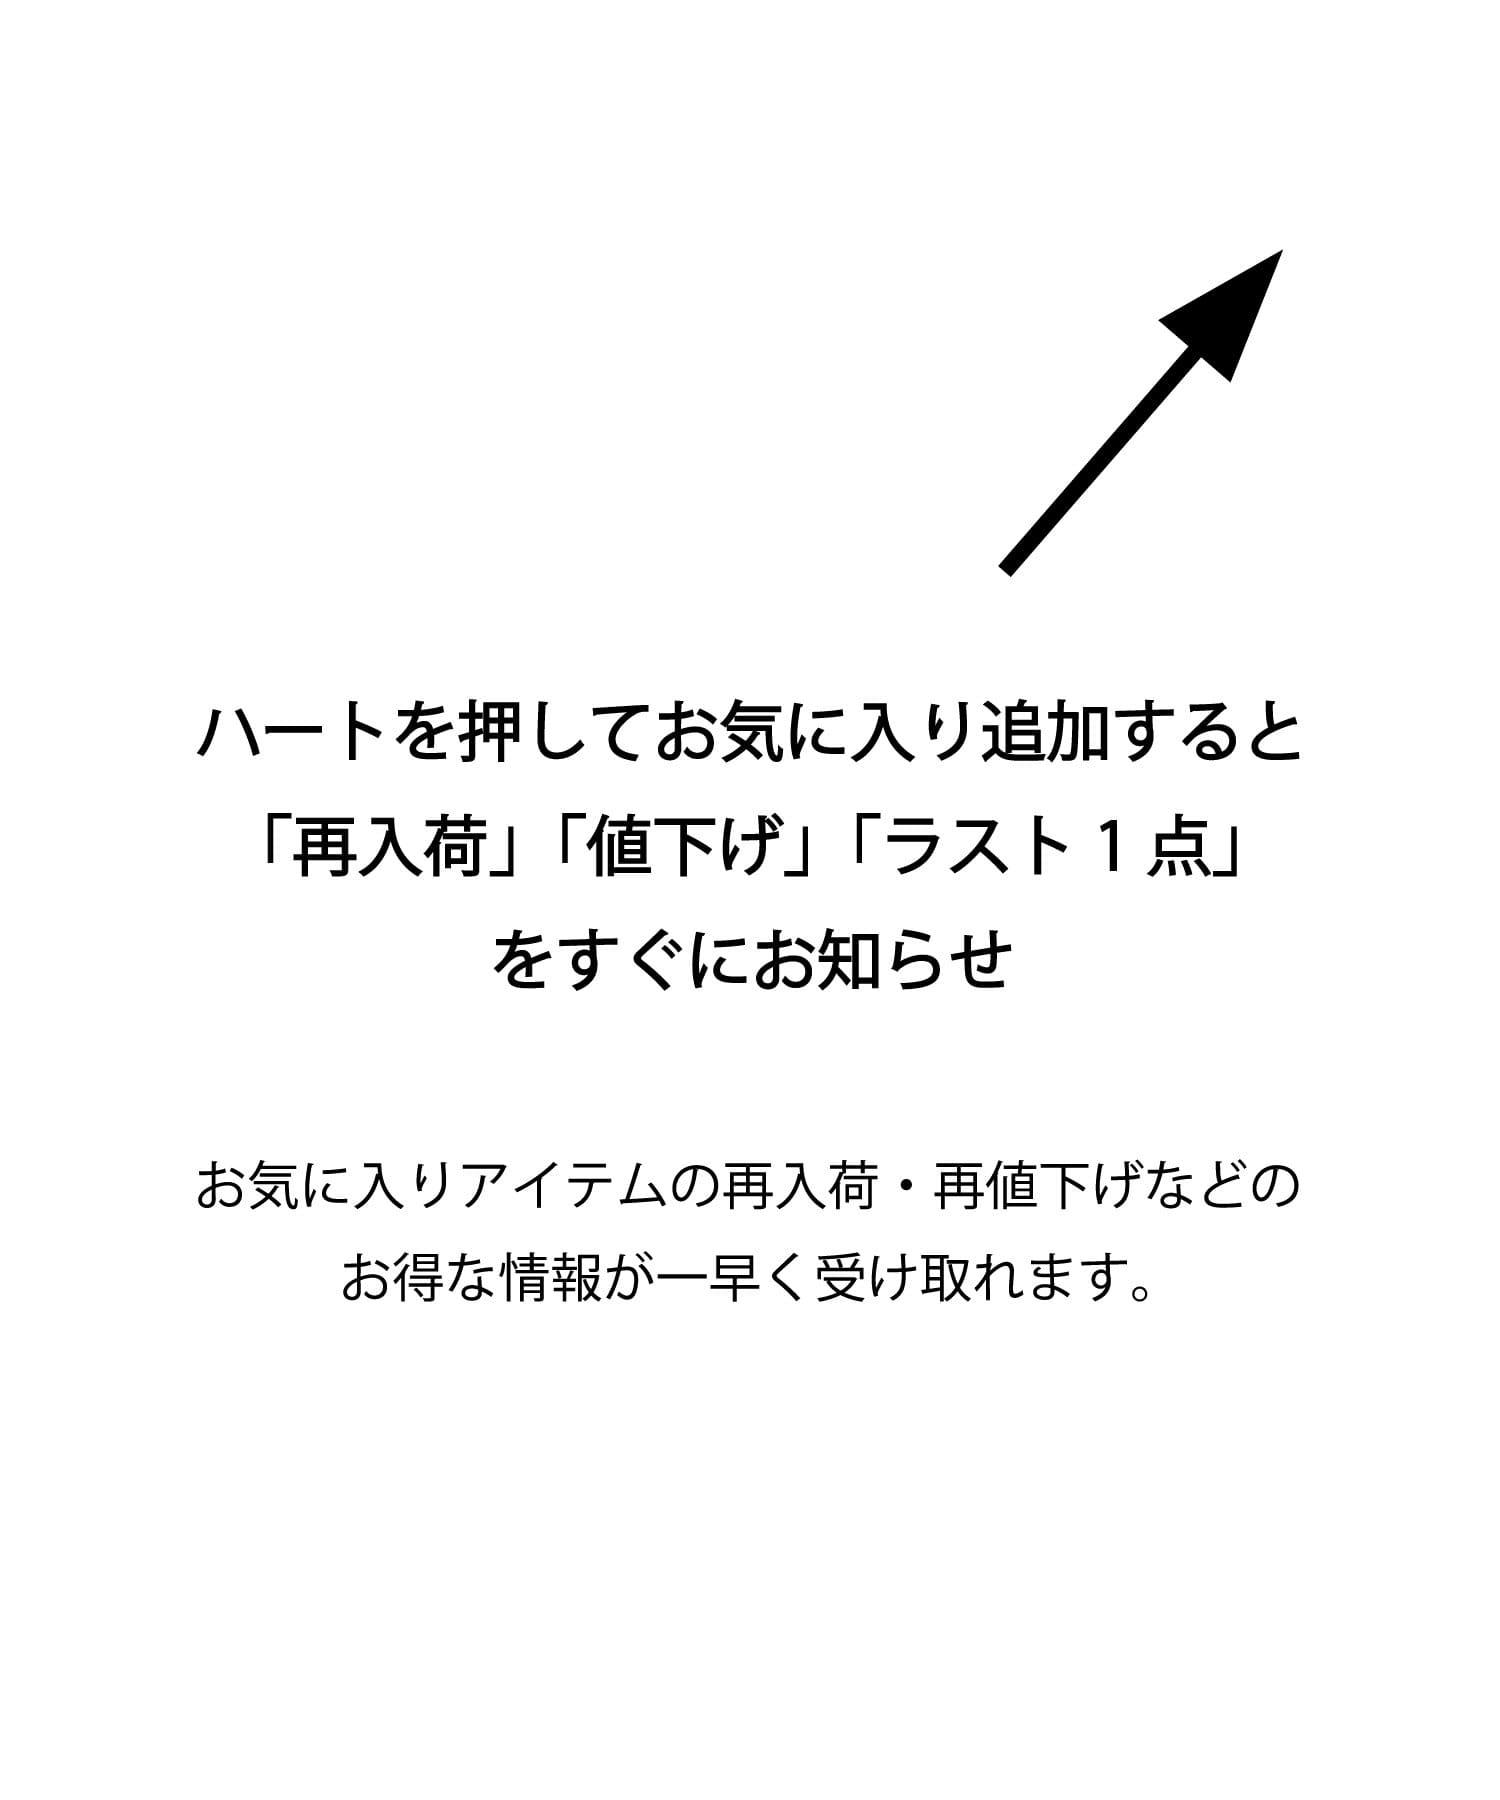 un dix cors(アンディコール) 【お仕事に使いやすい】スクエア切替バッグ